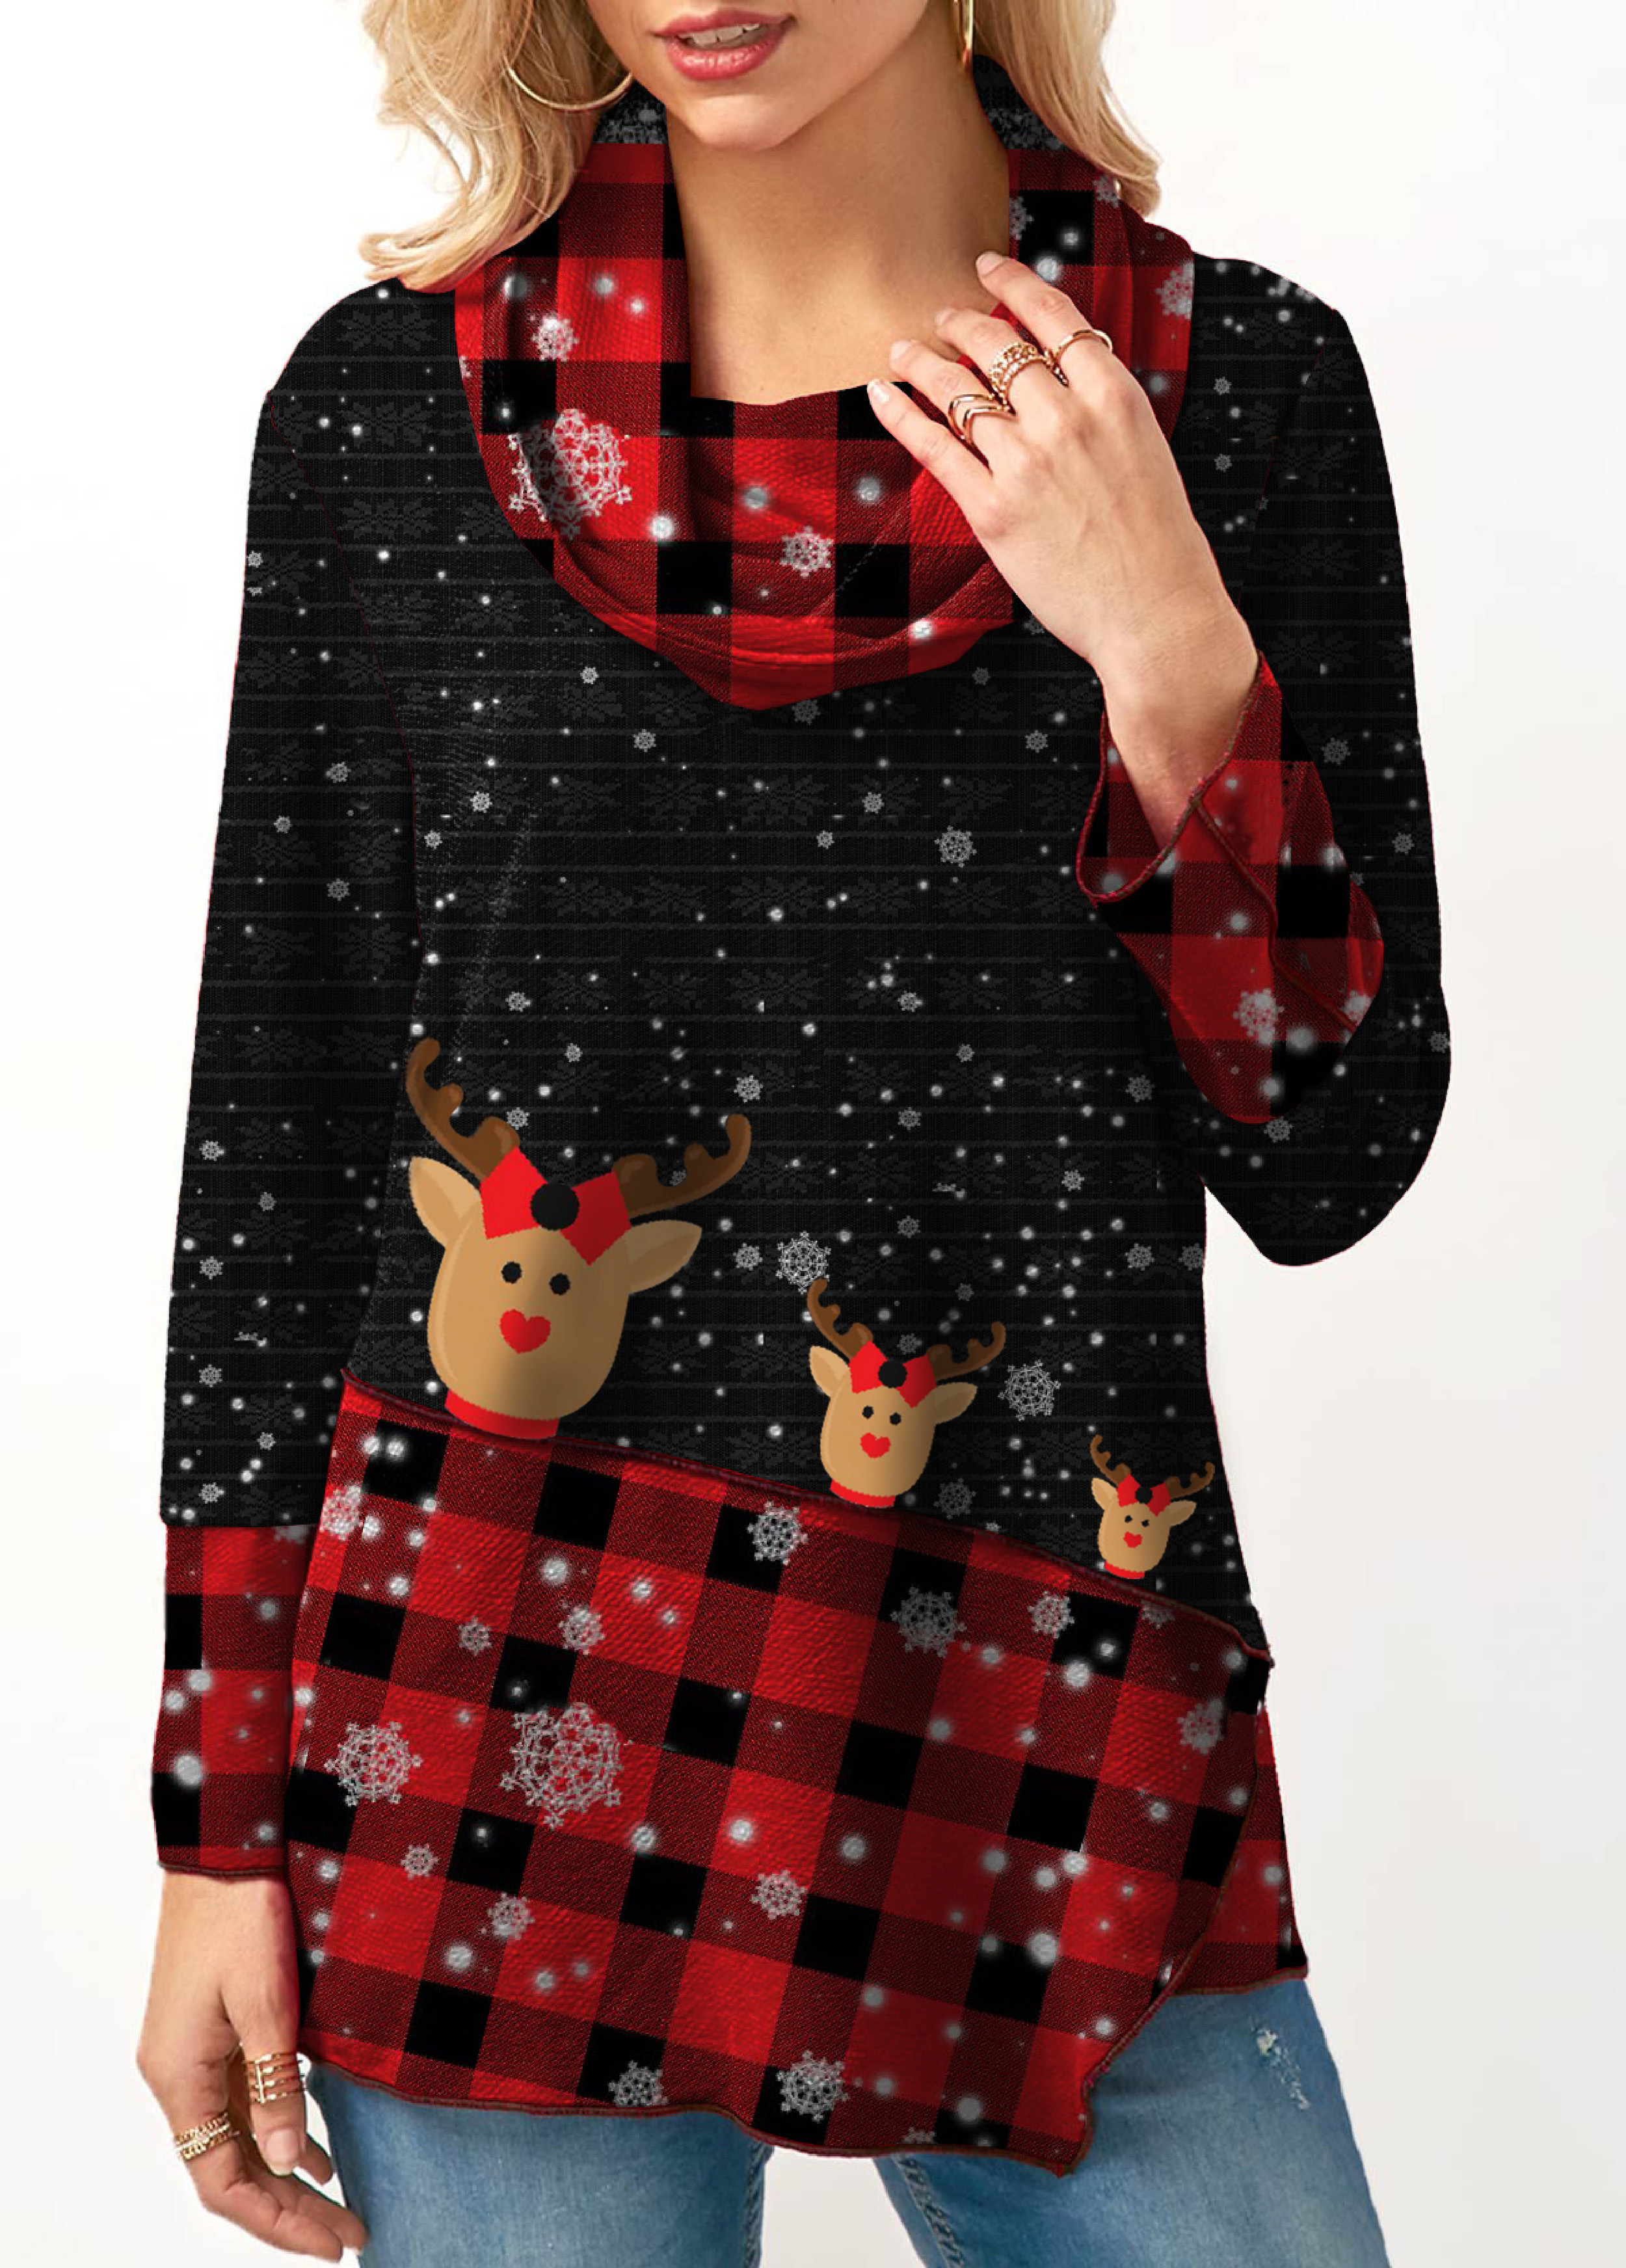 Cowl Neck Long Sleeve Plaid Print Christmas Sweatshirt